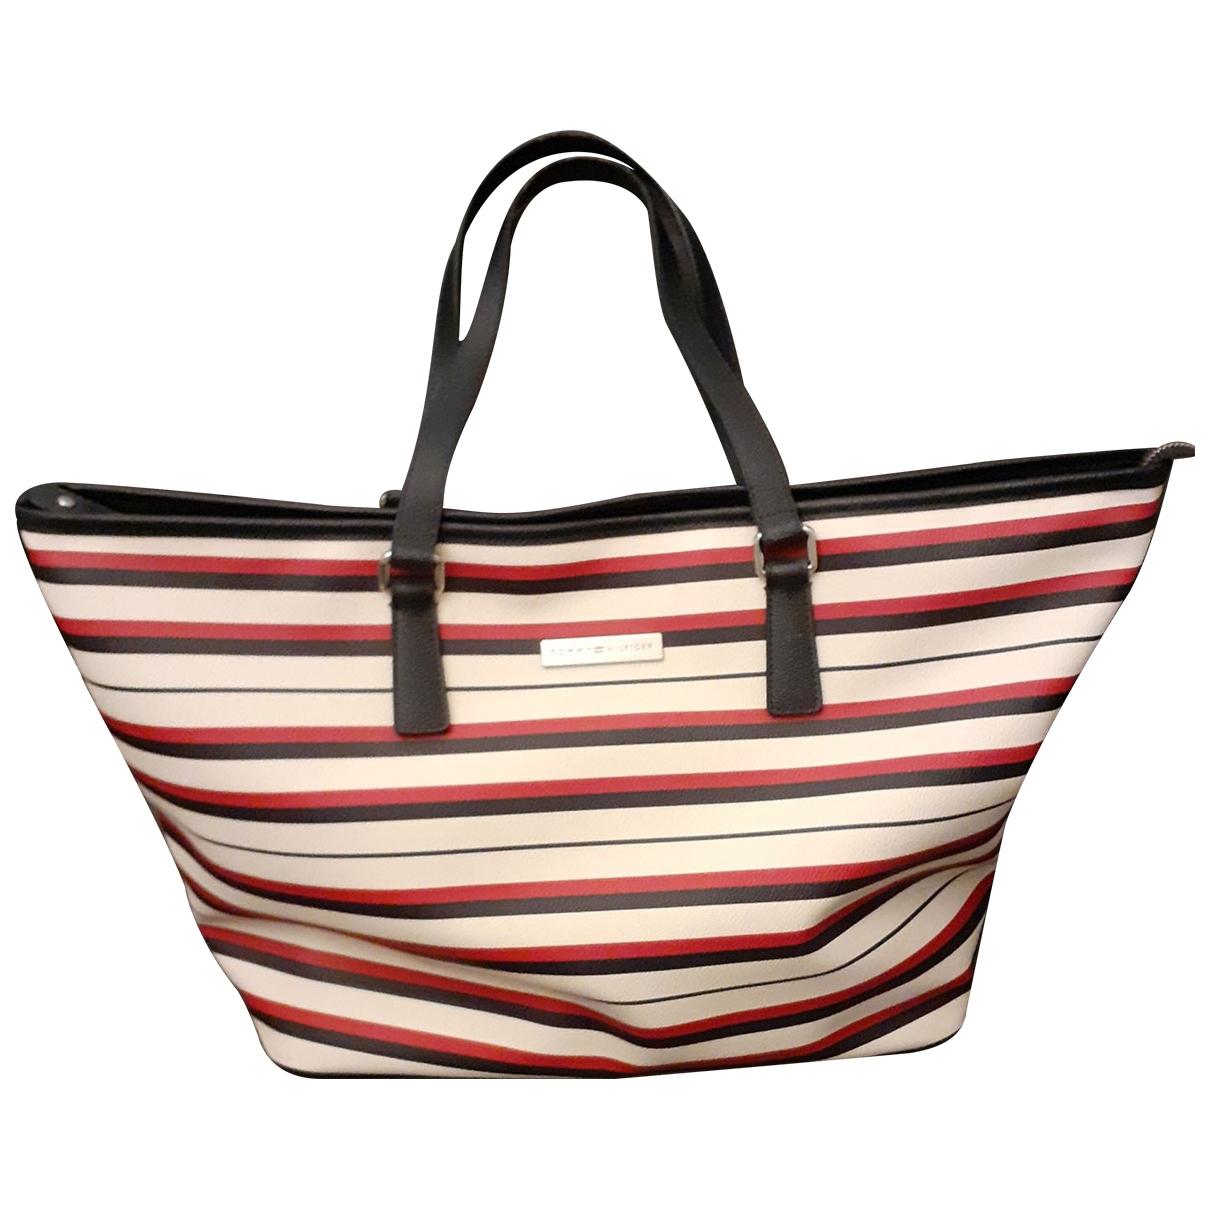 Tommy Hilfiger \N Multicolour Leather handbag for Women \N